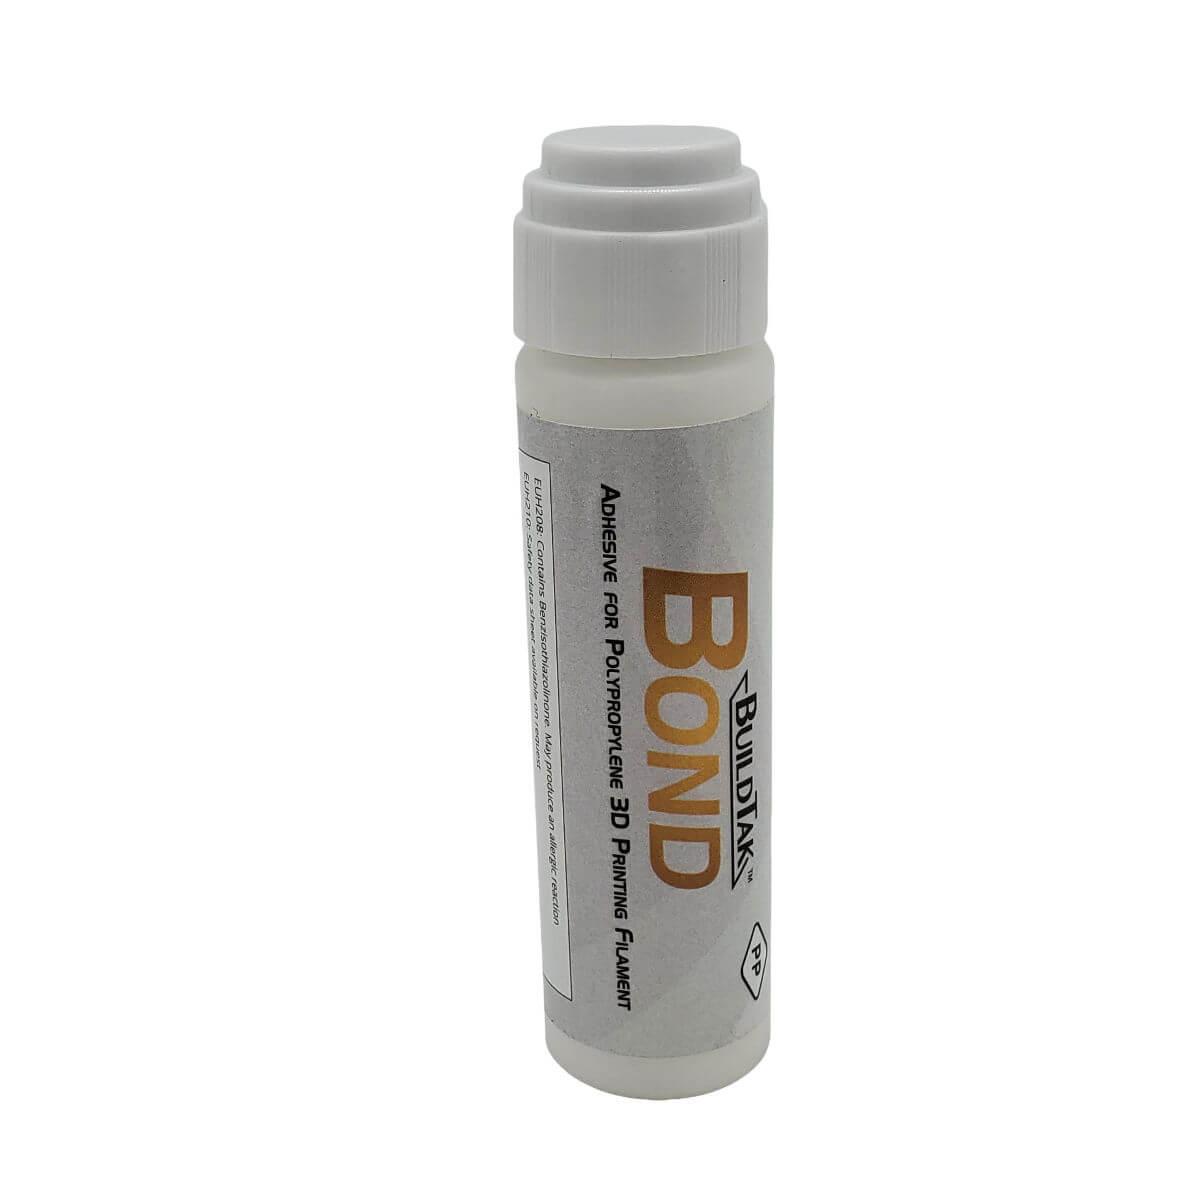 BuildTak Bond for Polypropylene - 3D Printer Adhesion Products